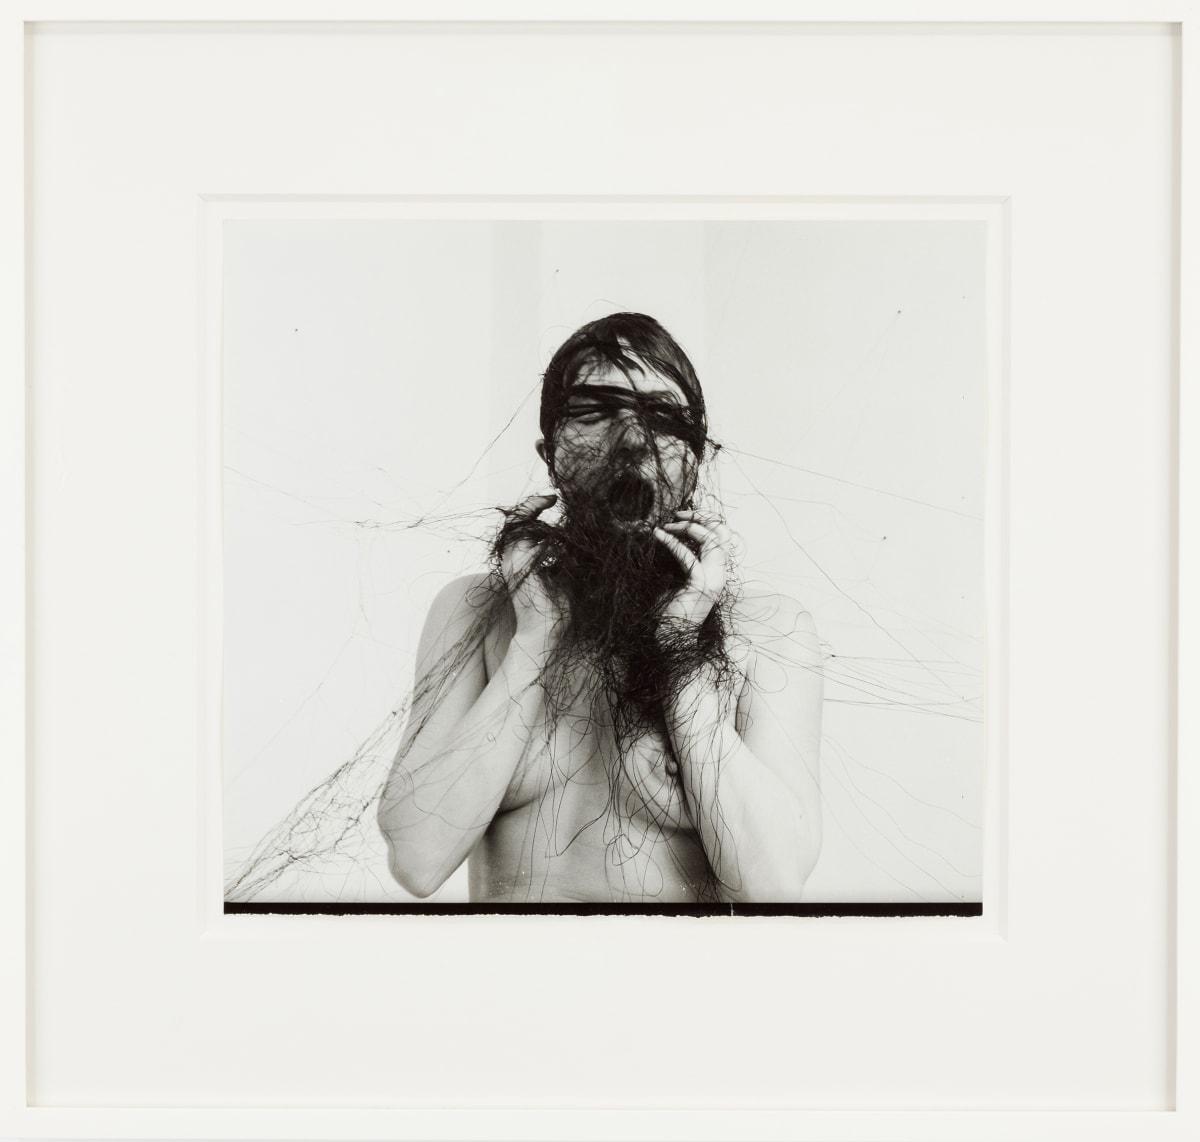 Annegret SOLTAU Permanent demonstration am 19.1.1976, 1976 Gelatin silver print, vintage 27.5 x 31 cm